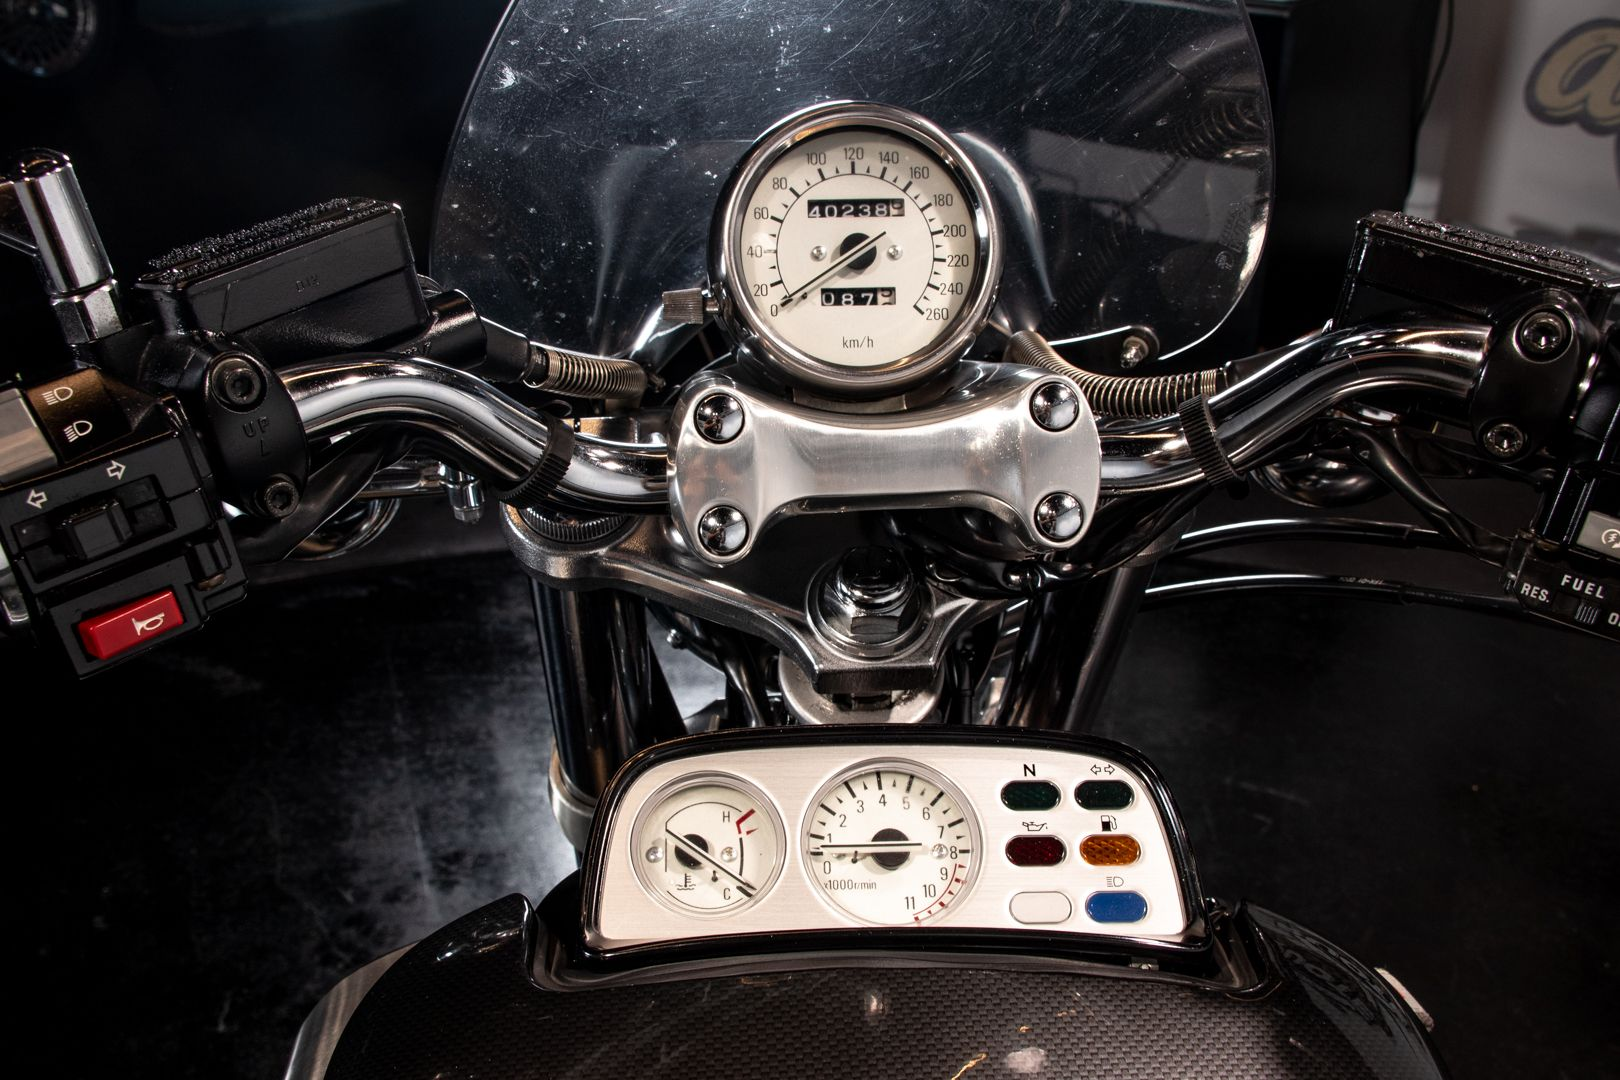 2001 Yamaha V MAX 73453